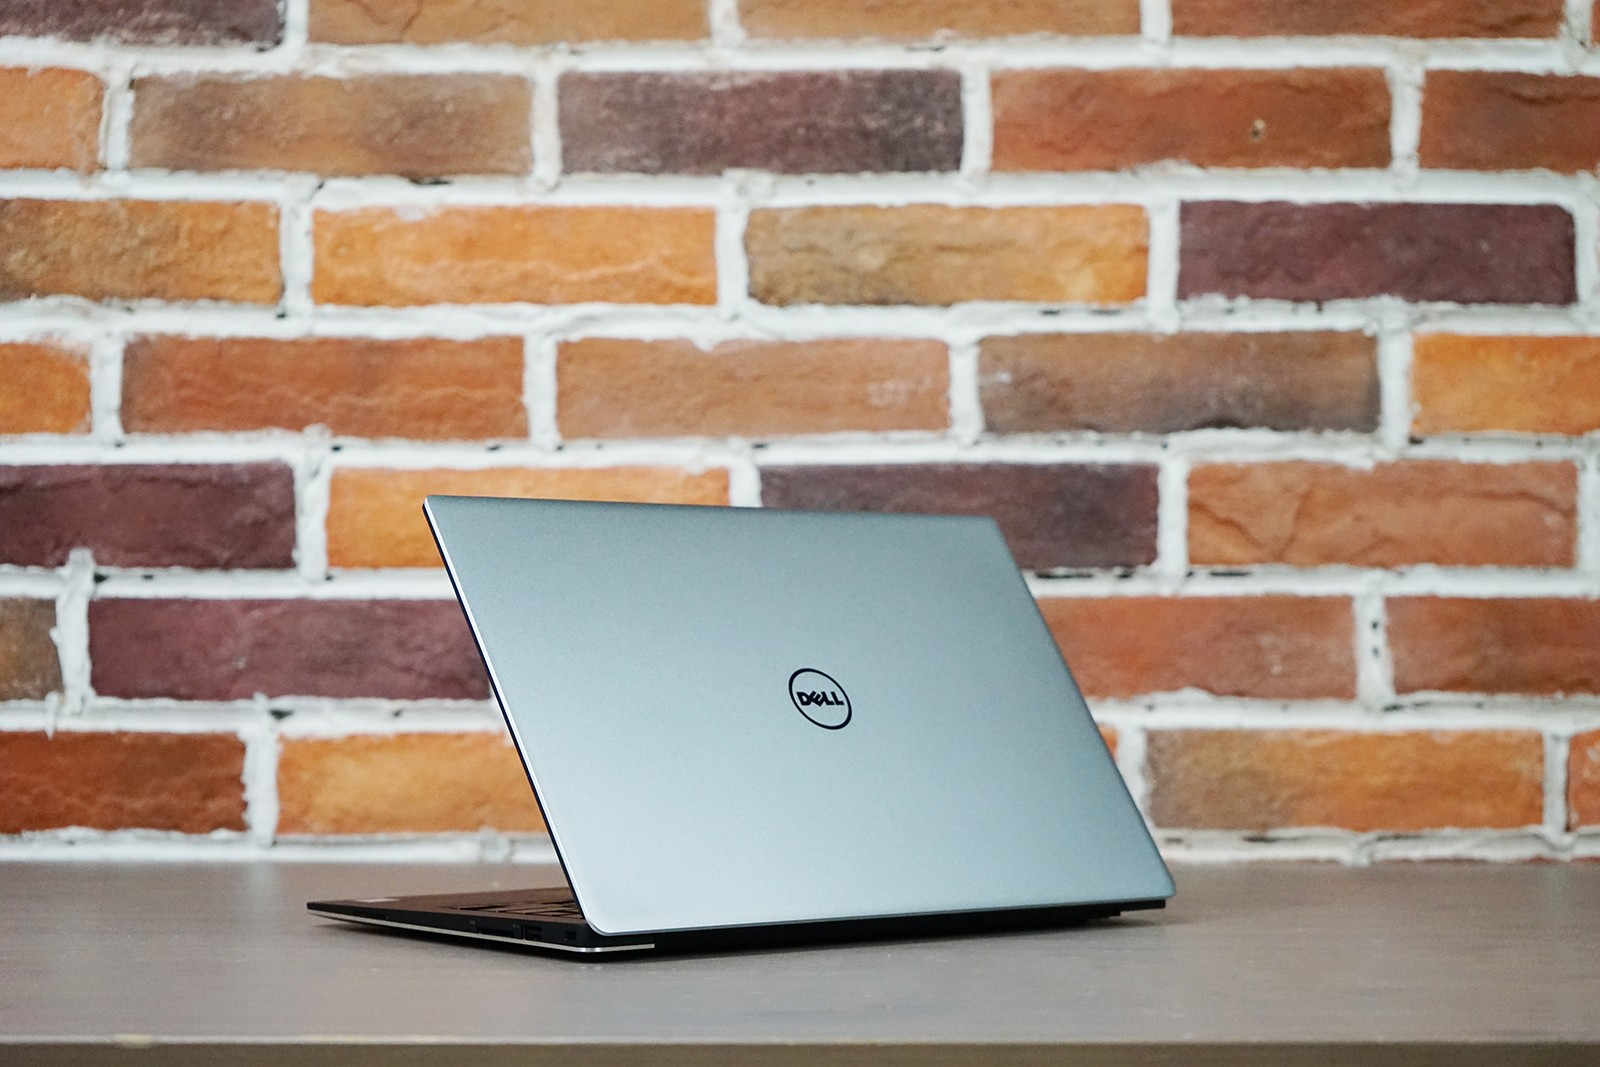 Dell XPS 13 9360 Review (i7-8550U) - Laptopmain com